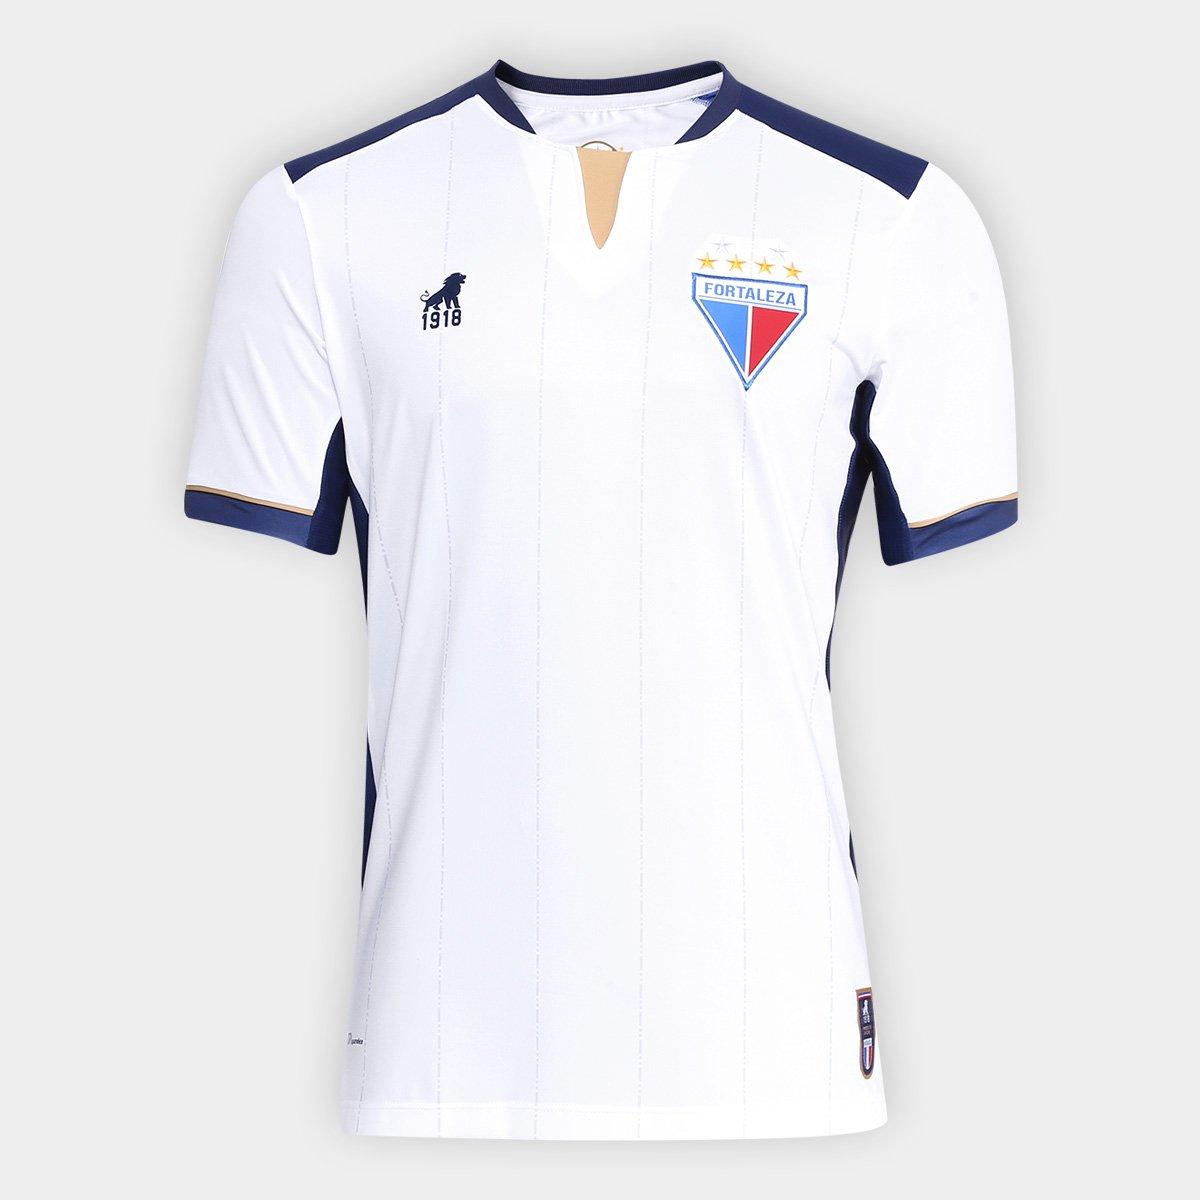 b98842213539f Camisa Fortaleza II n° 18 17 18 Masculina - Compre Agora